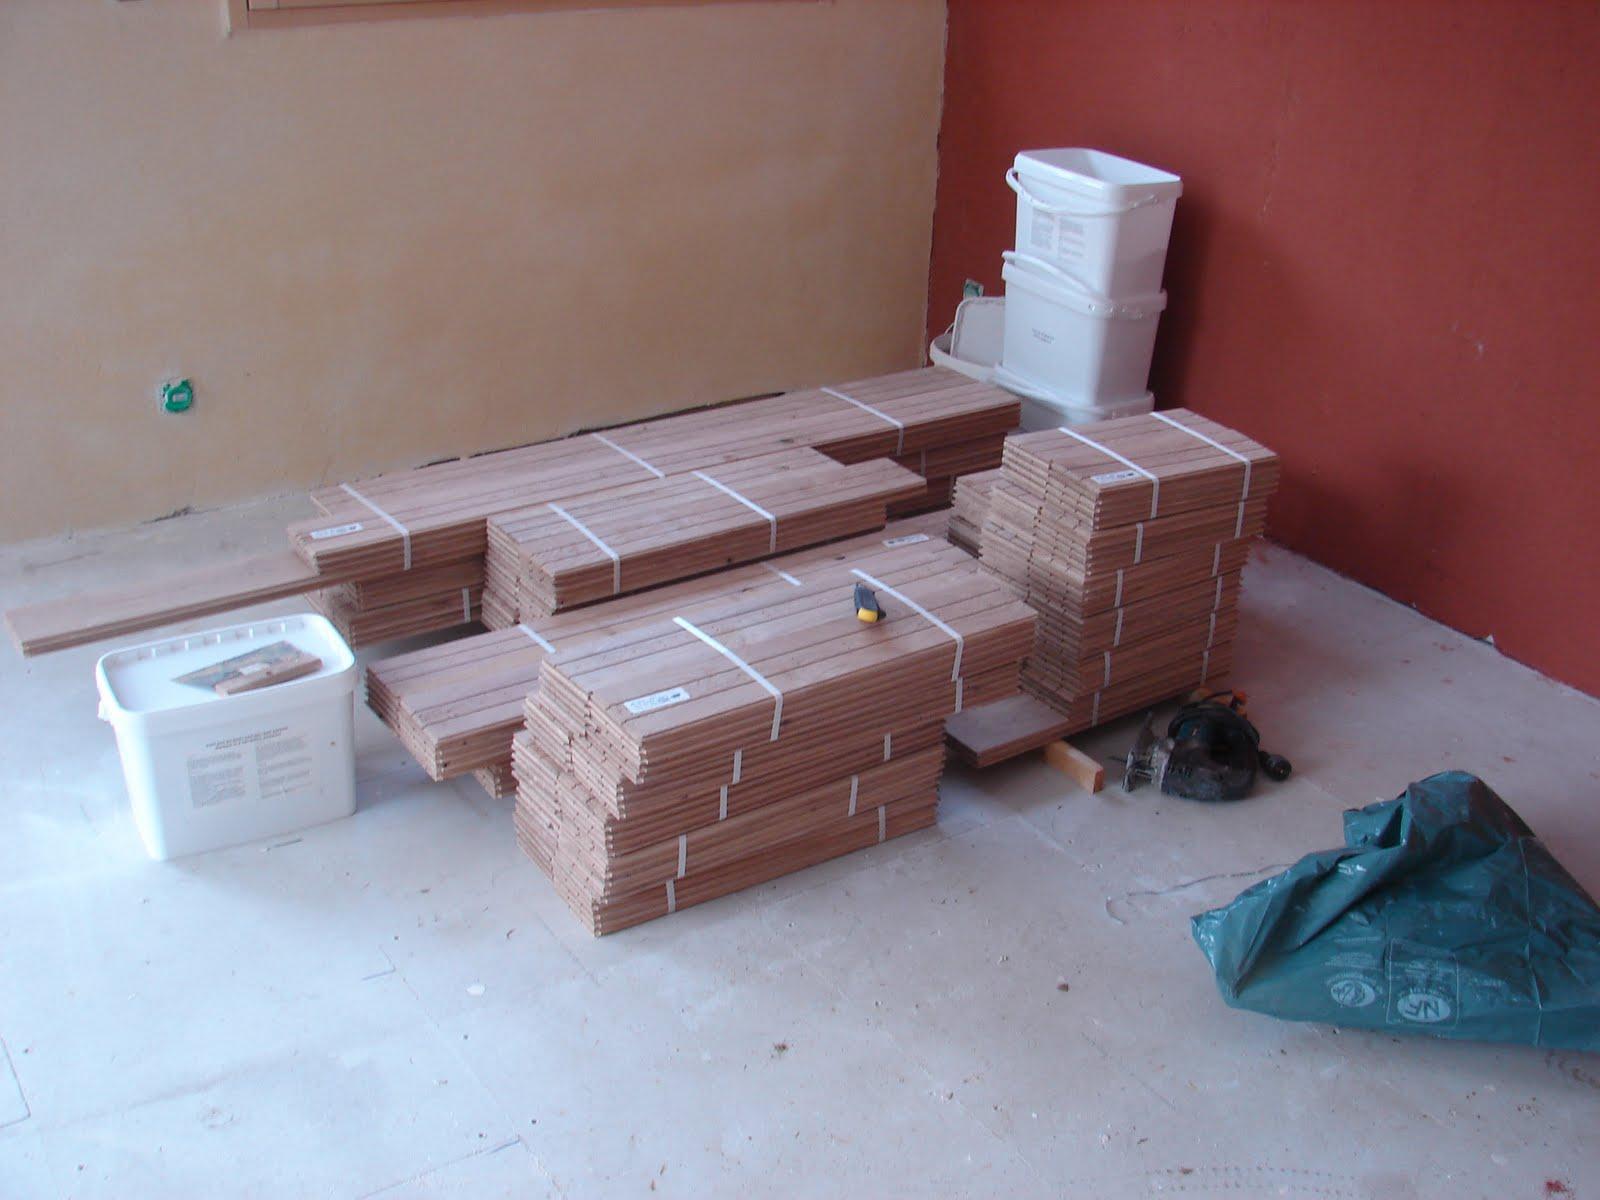 habitat bois parquets carrelage. Black Bedroom Furniture Sets. Home Design Ideas